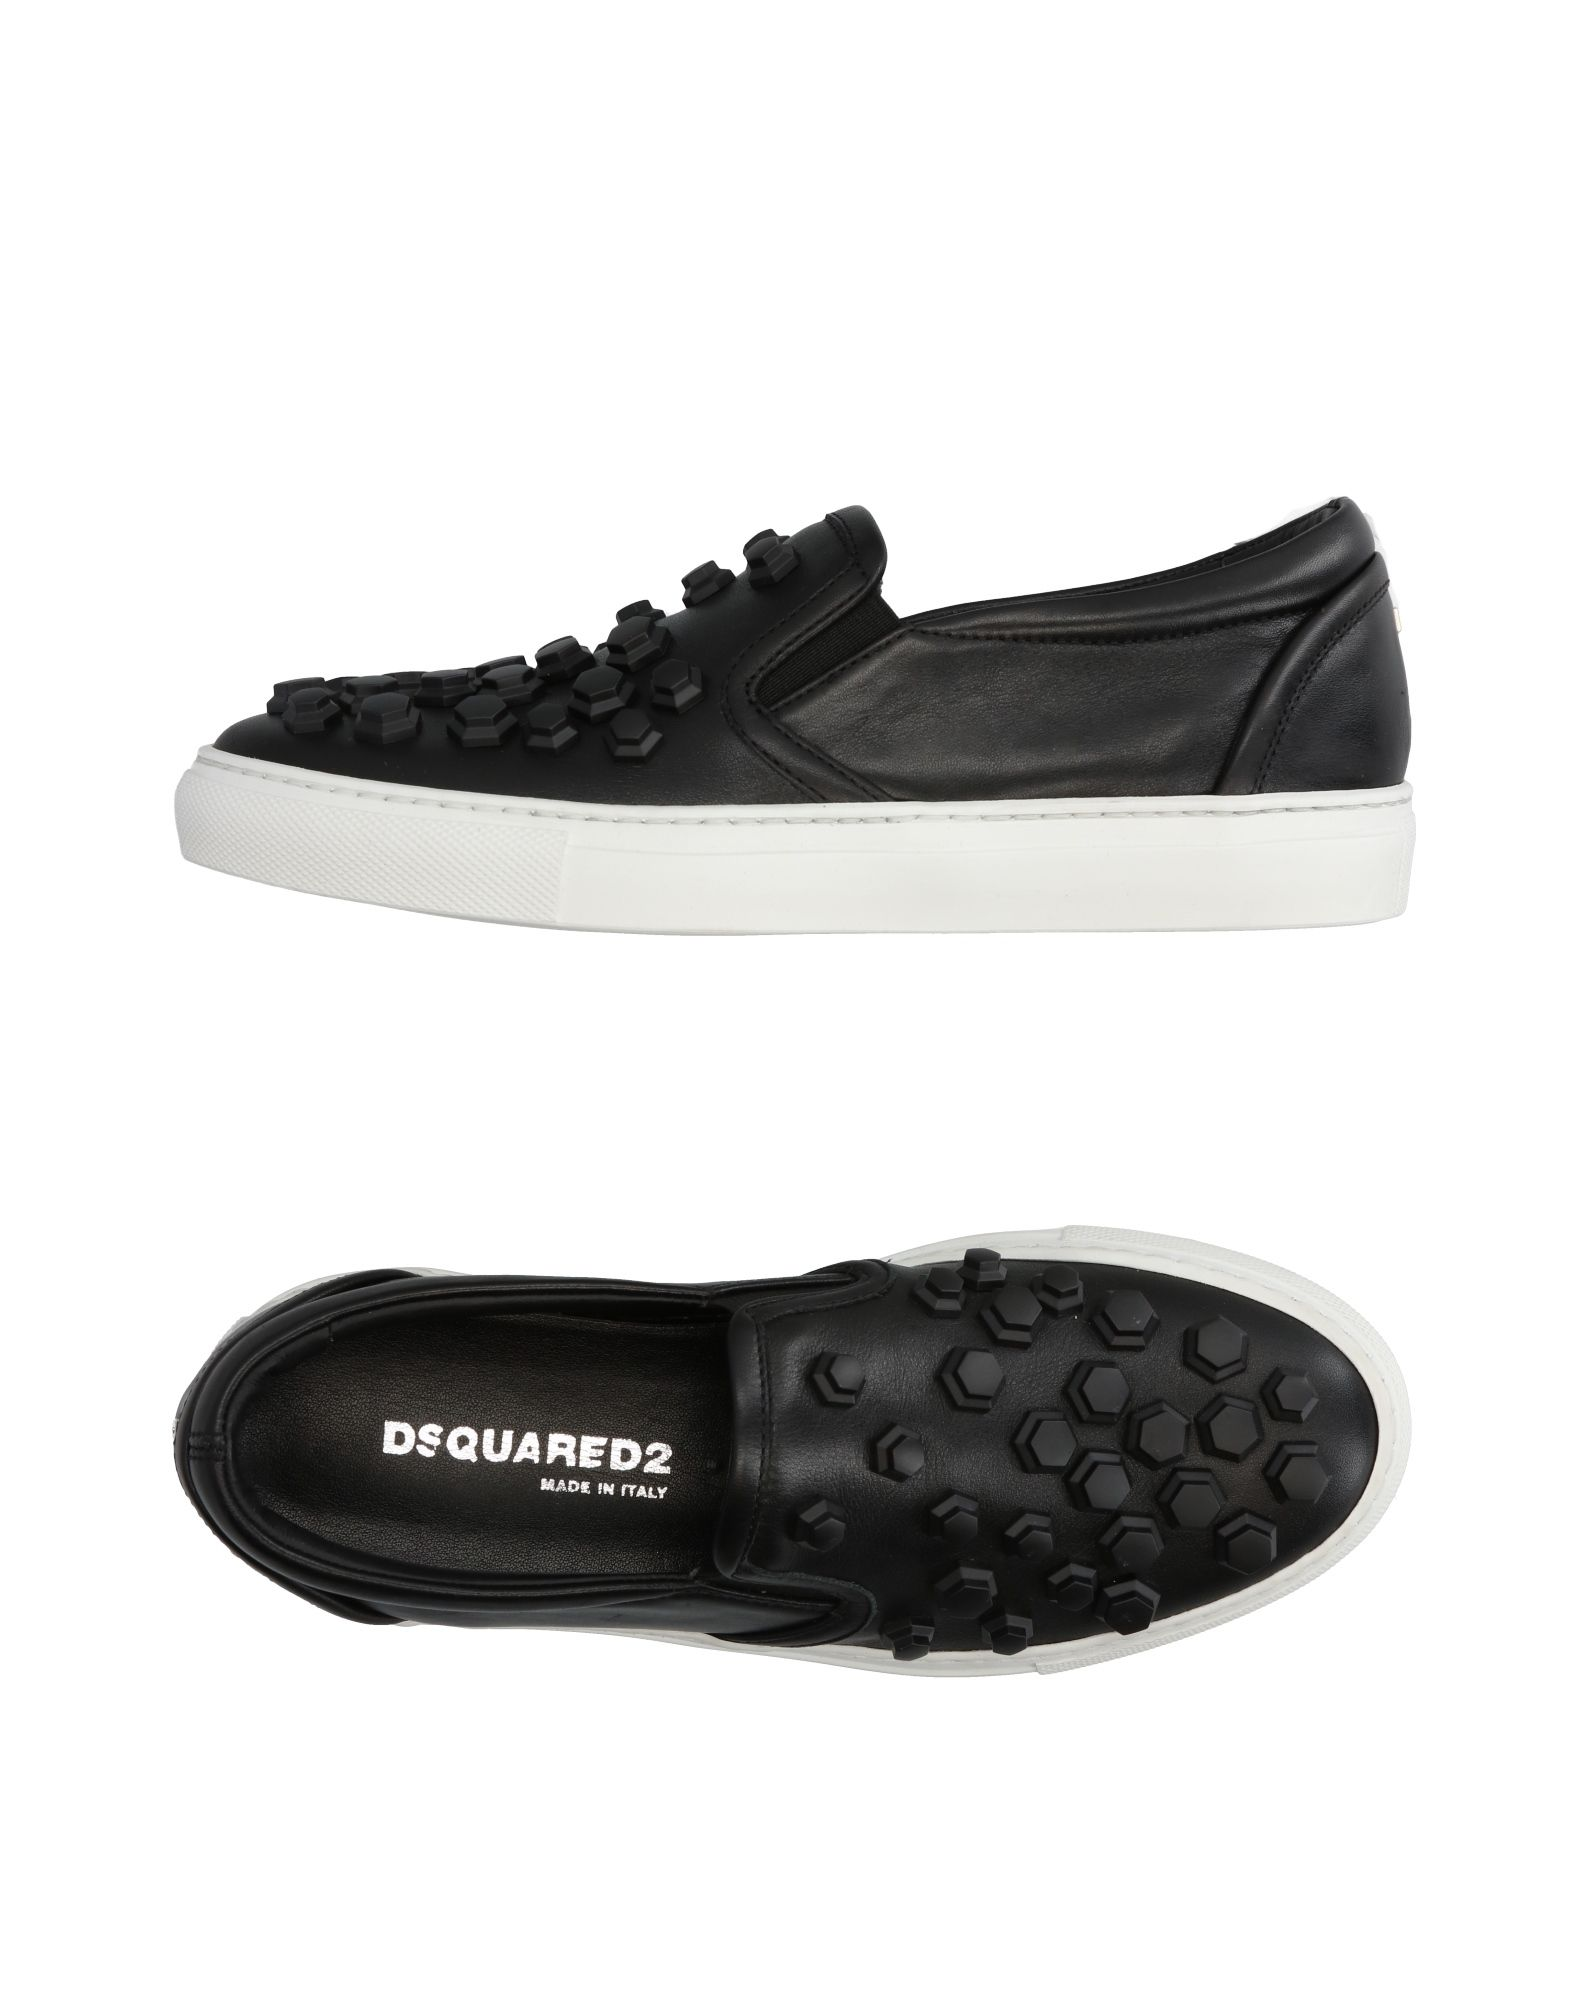 Dsquared2 Sneakers Damen  11298682WGGünstige Schuhe gut aussehende Schuhe 11298682WGGünstige 3c0bd9